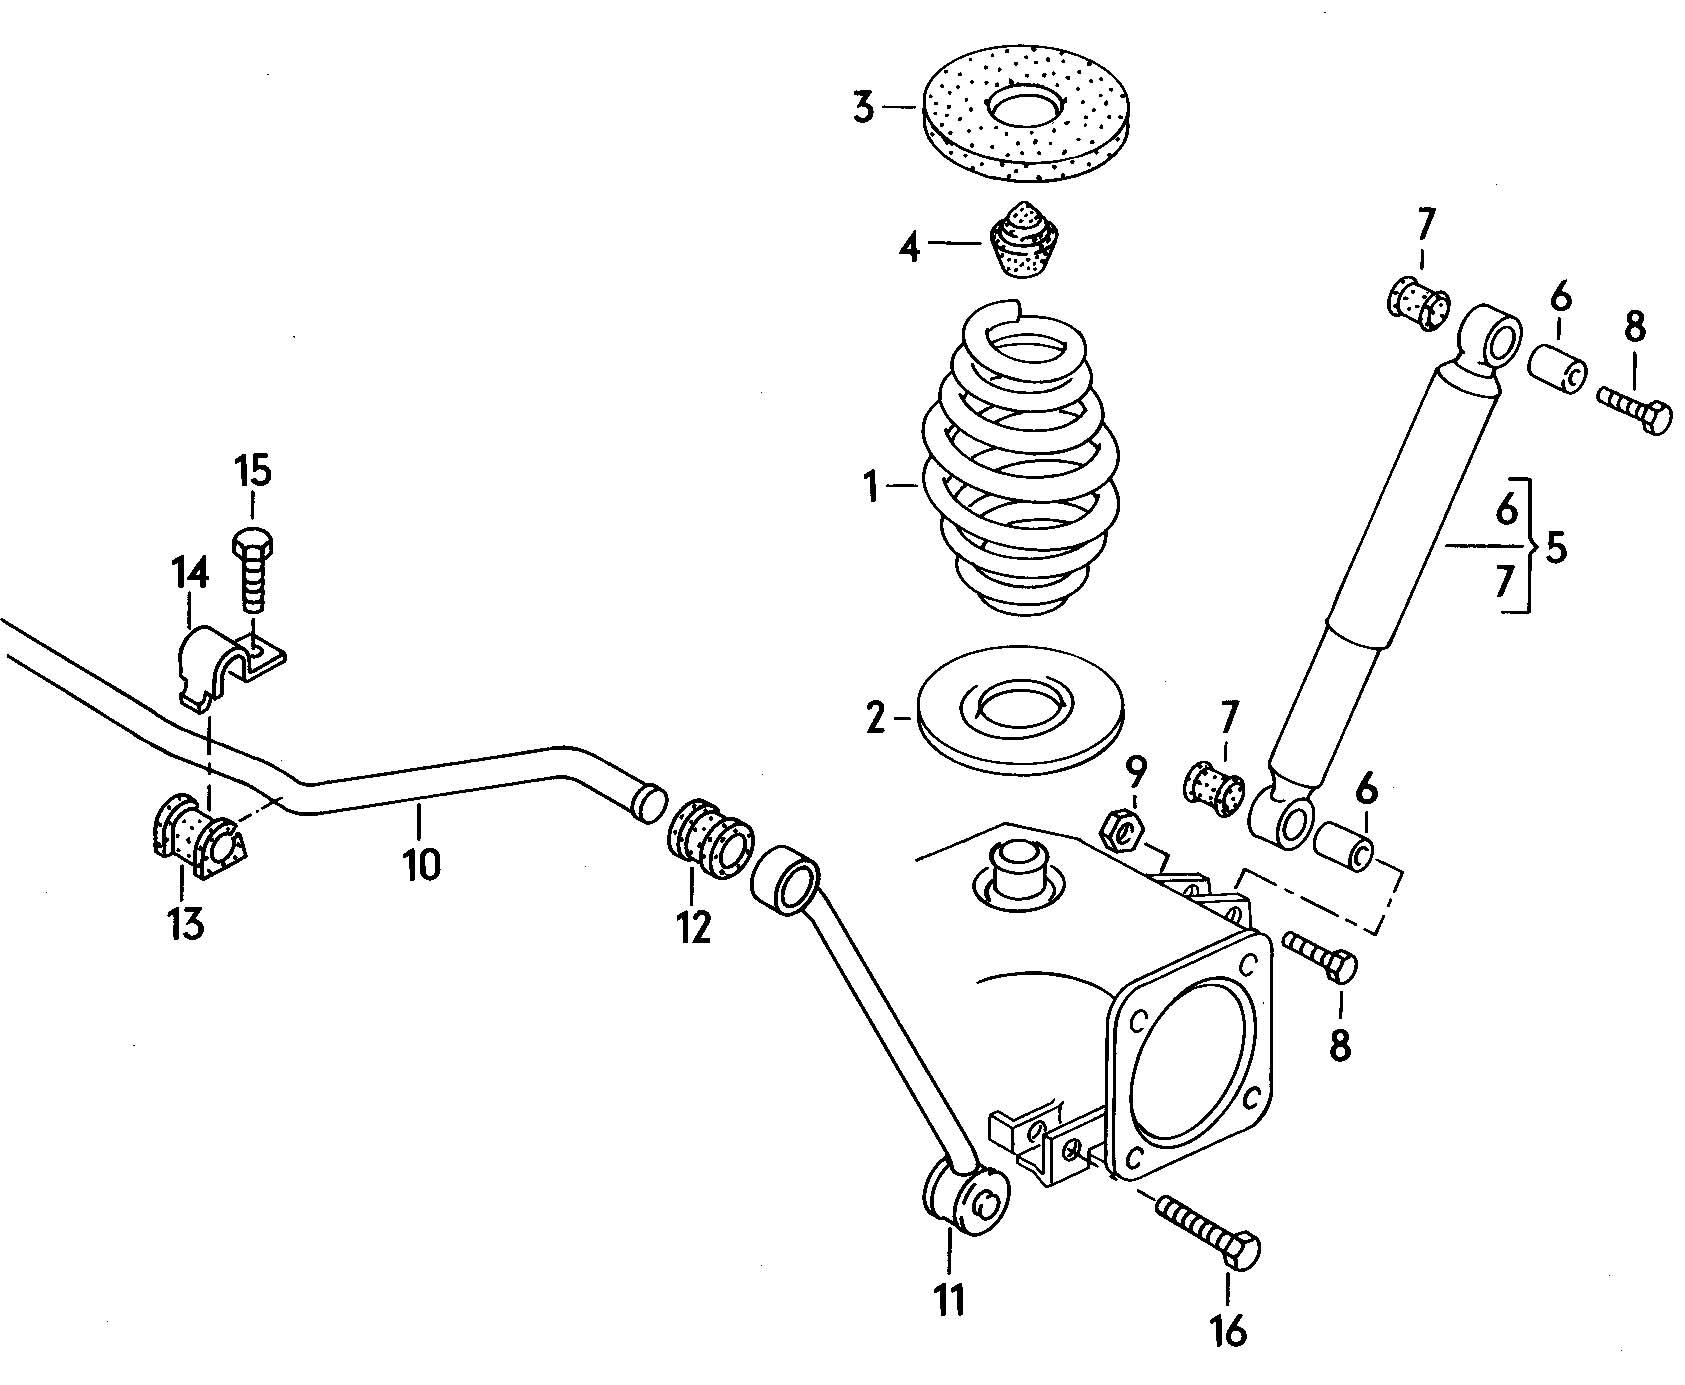 1989 Volkswagen Cabriolet Wiring Diagram. Volkswagen. Auto